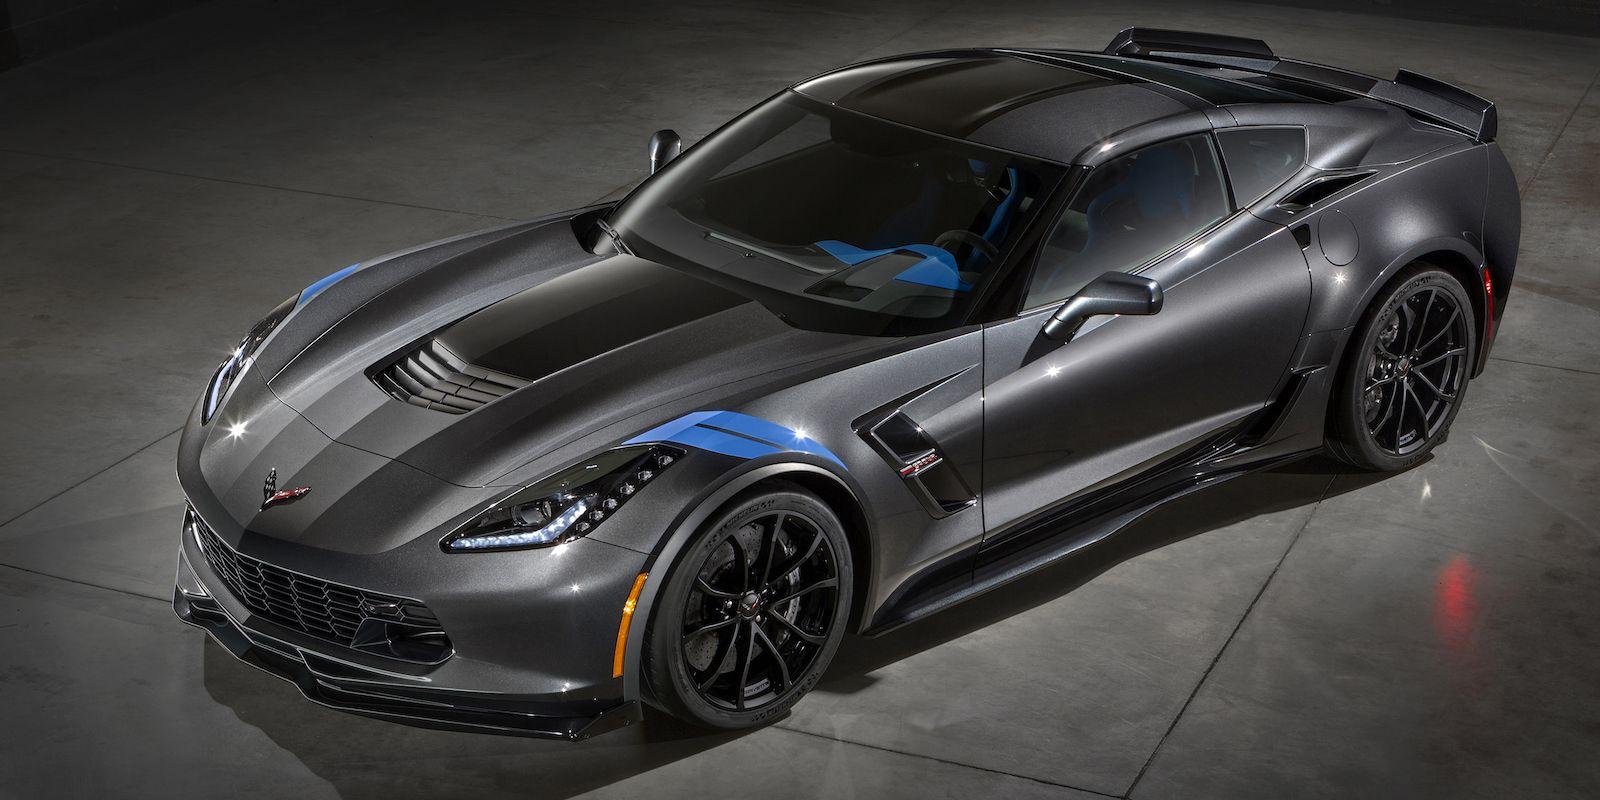 Kelebihan Corvette Z6 Murah Berkualitas